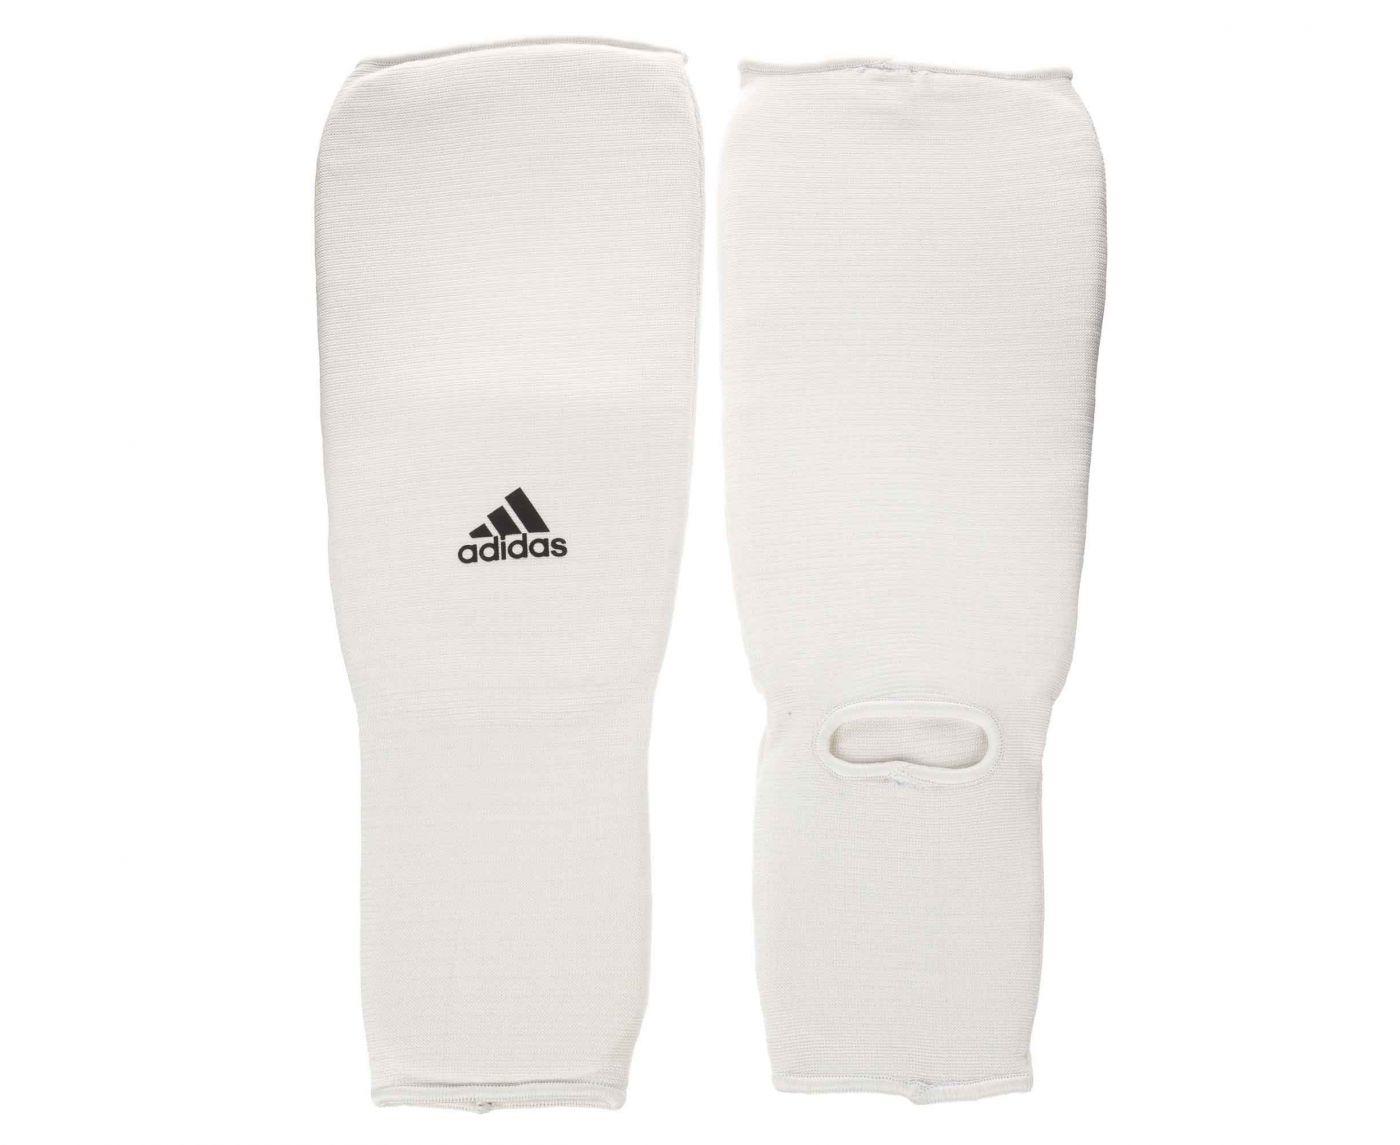 Защита голеностопа Adidas Shin and Step Pad белая, размер XS, артикул adiBP08